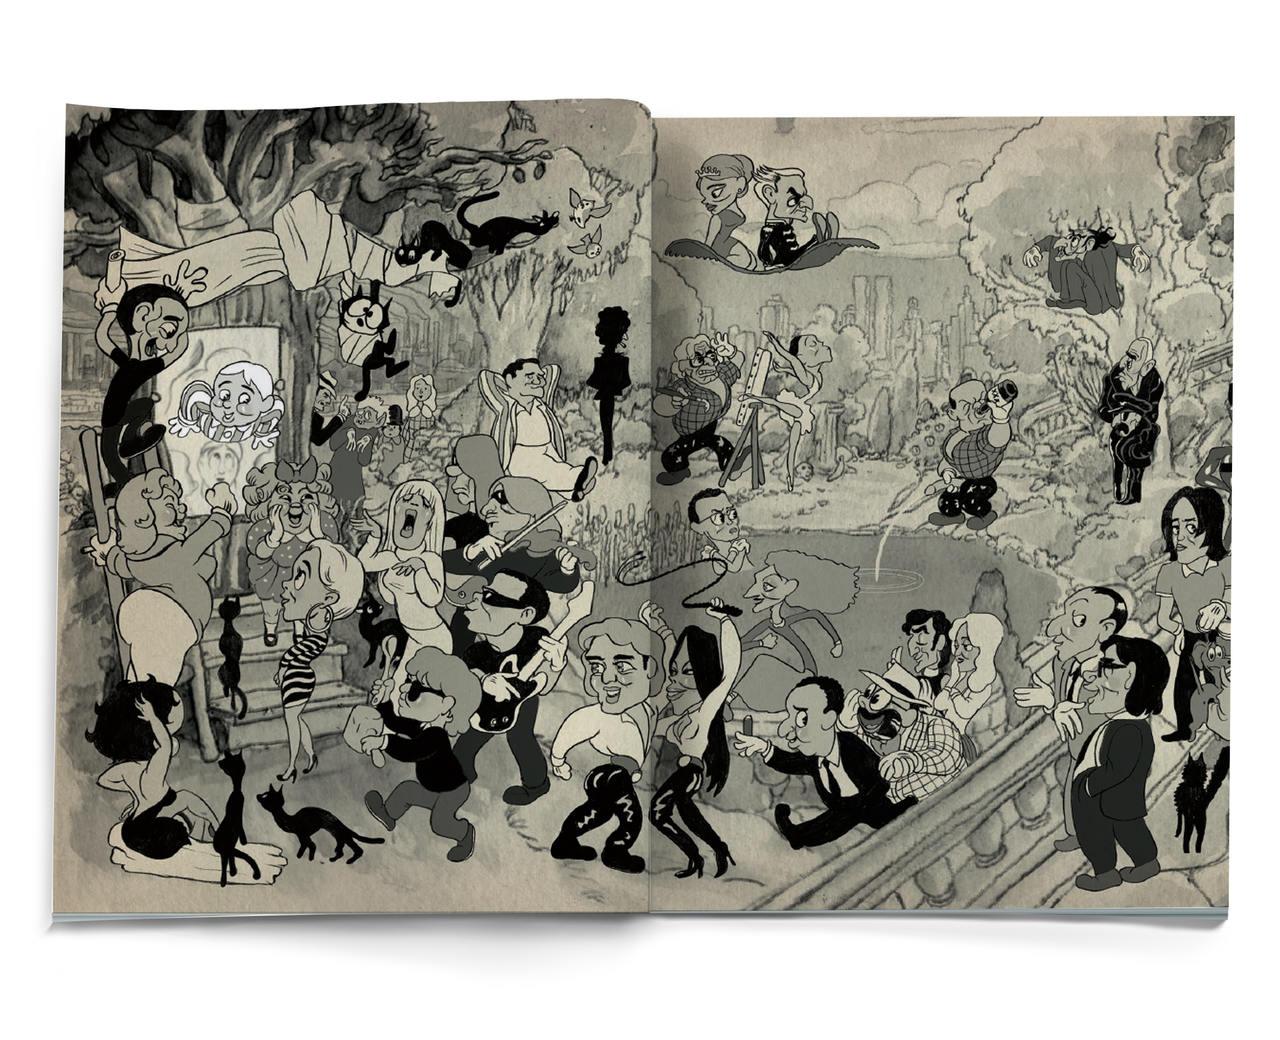 aleksundshantu_Andy-warhol_comic-bookpics-2